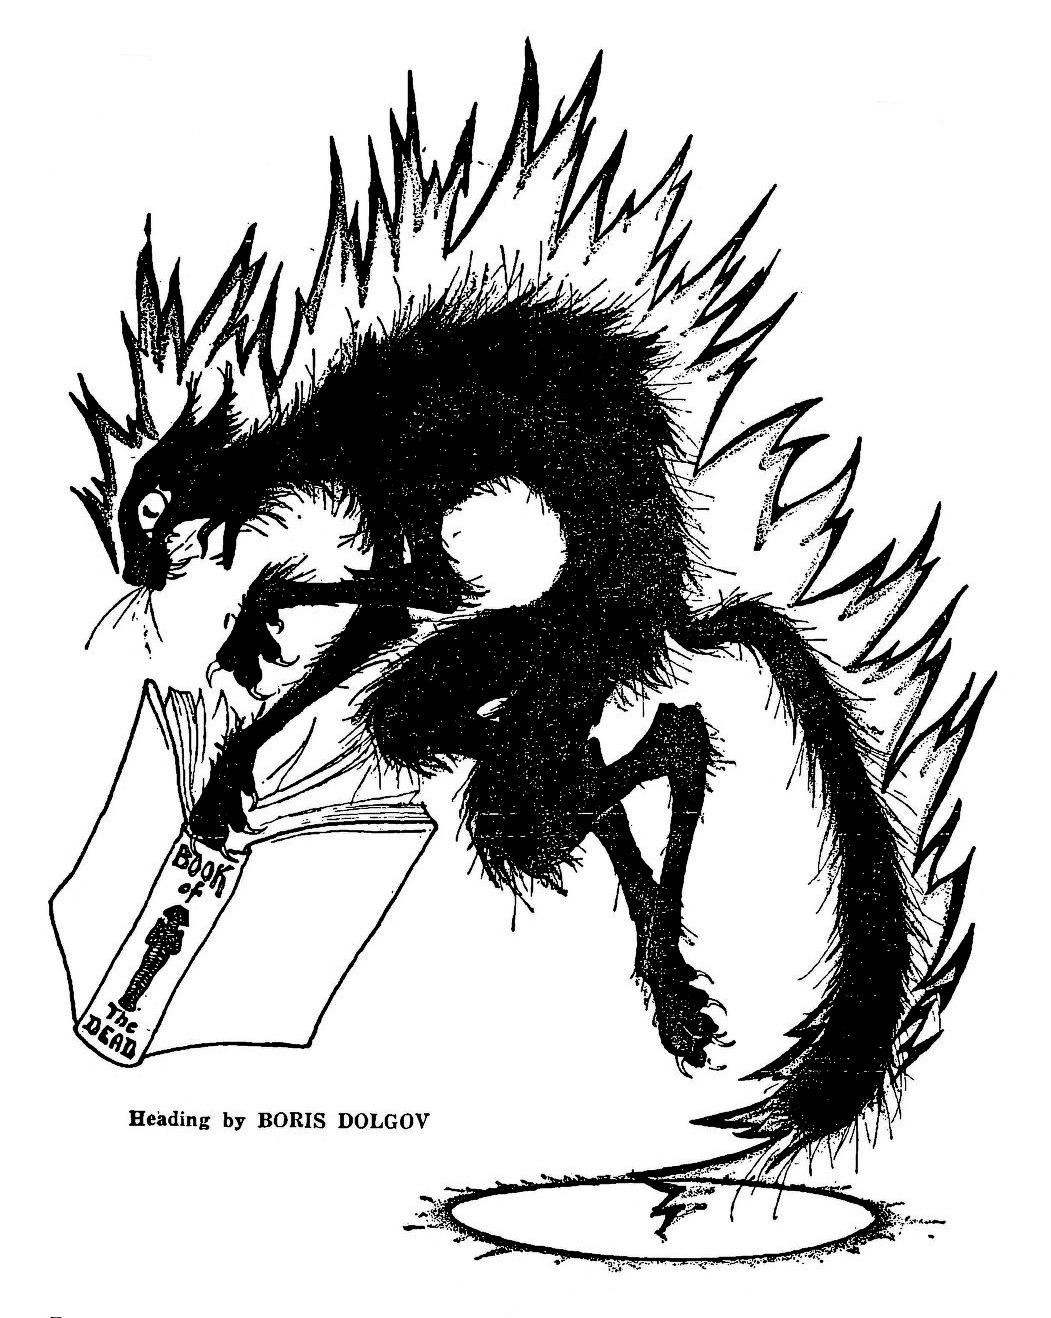 Boris Dolgov, Illustration for Balu Weird Tales Vol. 41, 2, 1949evahalloween